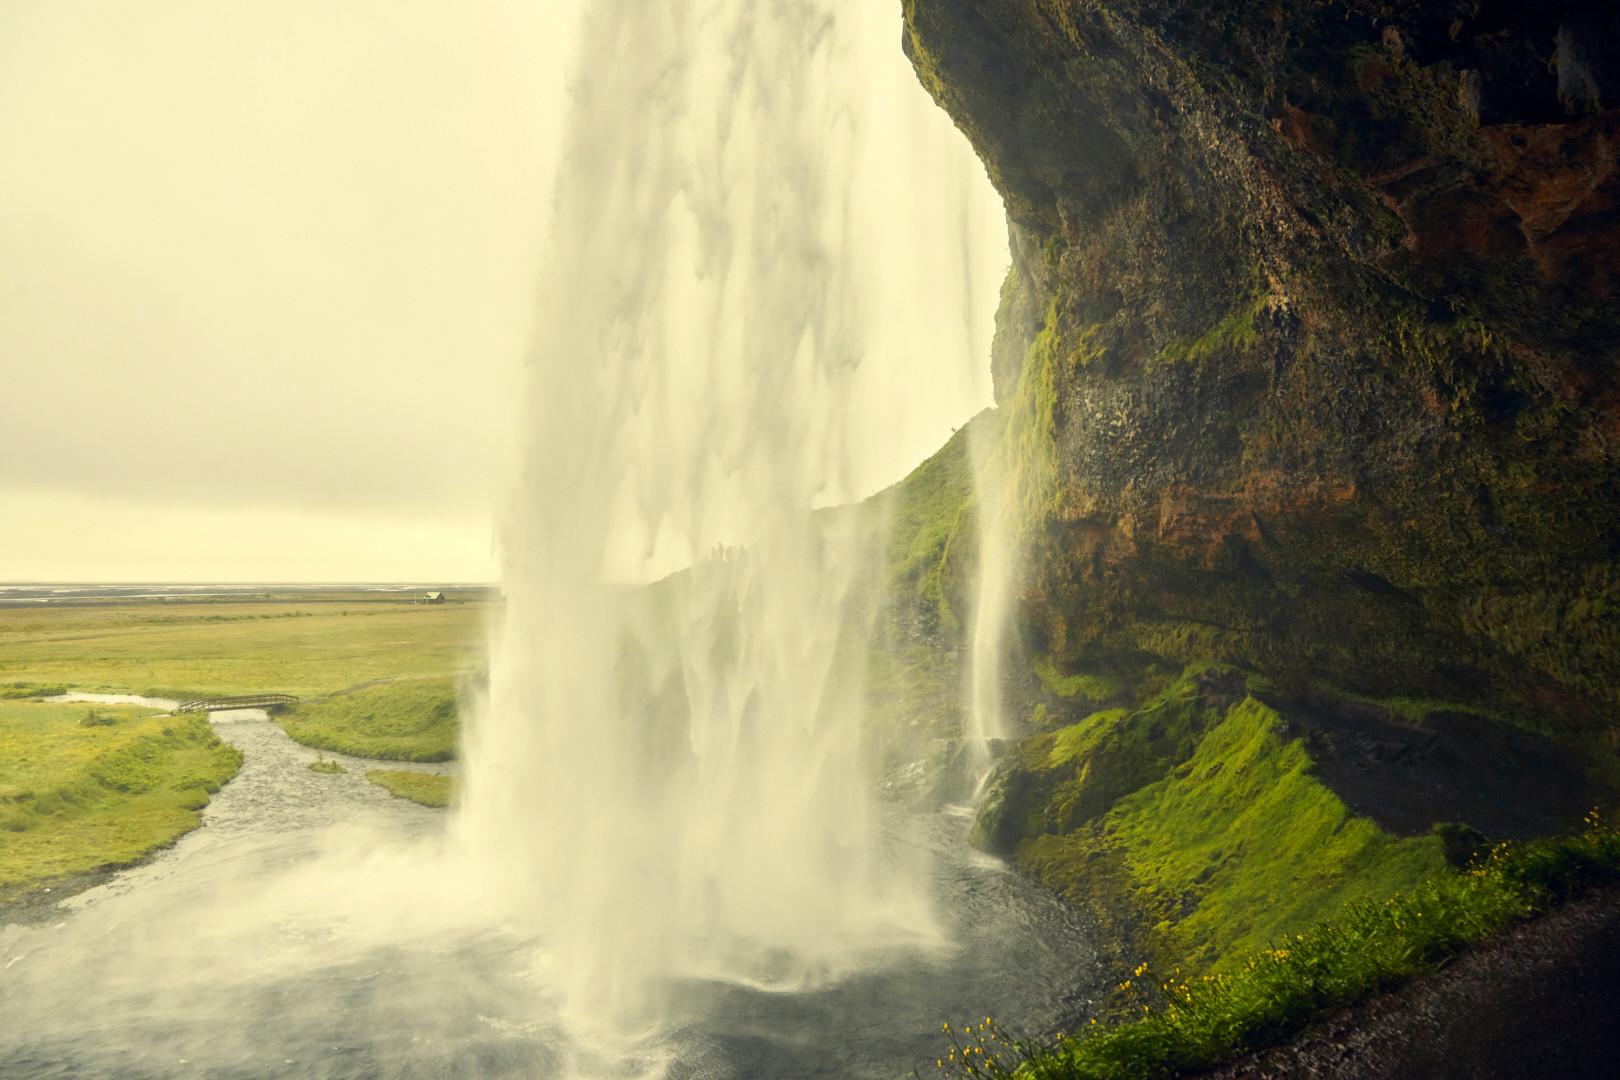 island, iceland, reiseblog, Seljandsfoss, Wasserfall, waterfall, no drone zone, no drones, no fly zone, erfahrung, erfahrungsbericht, roadtrip